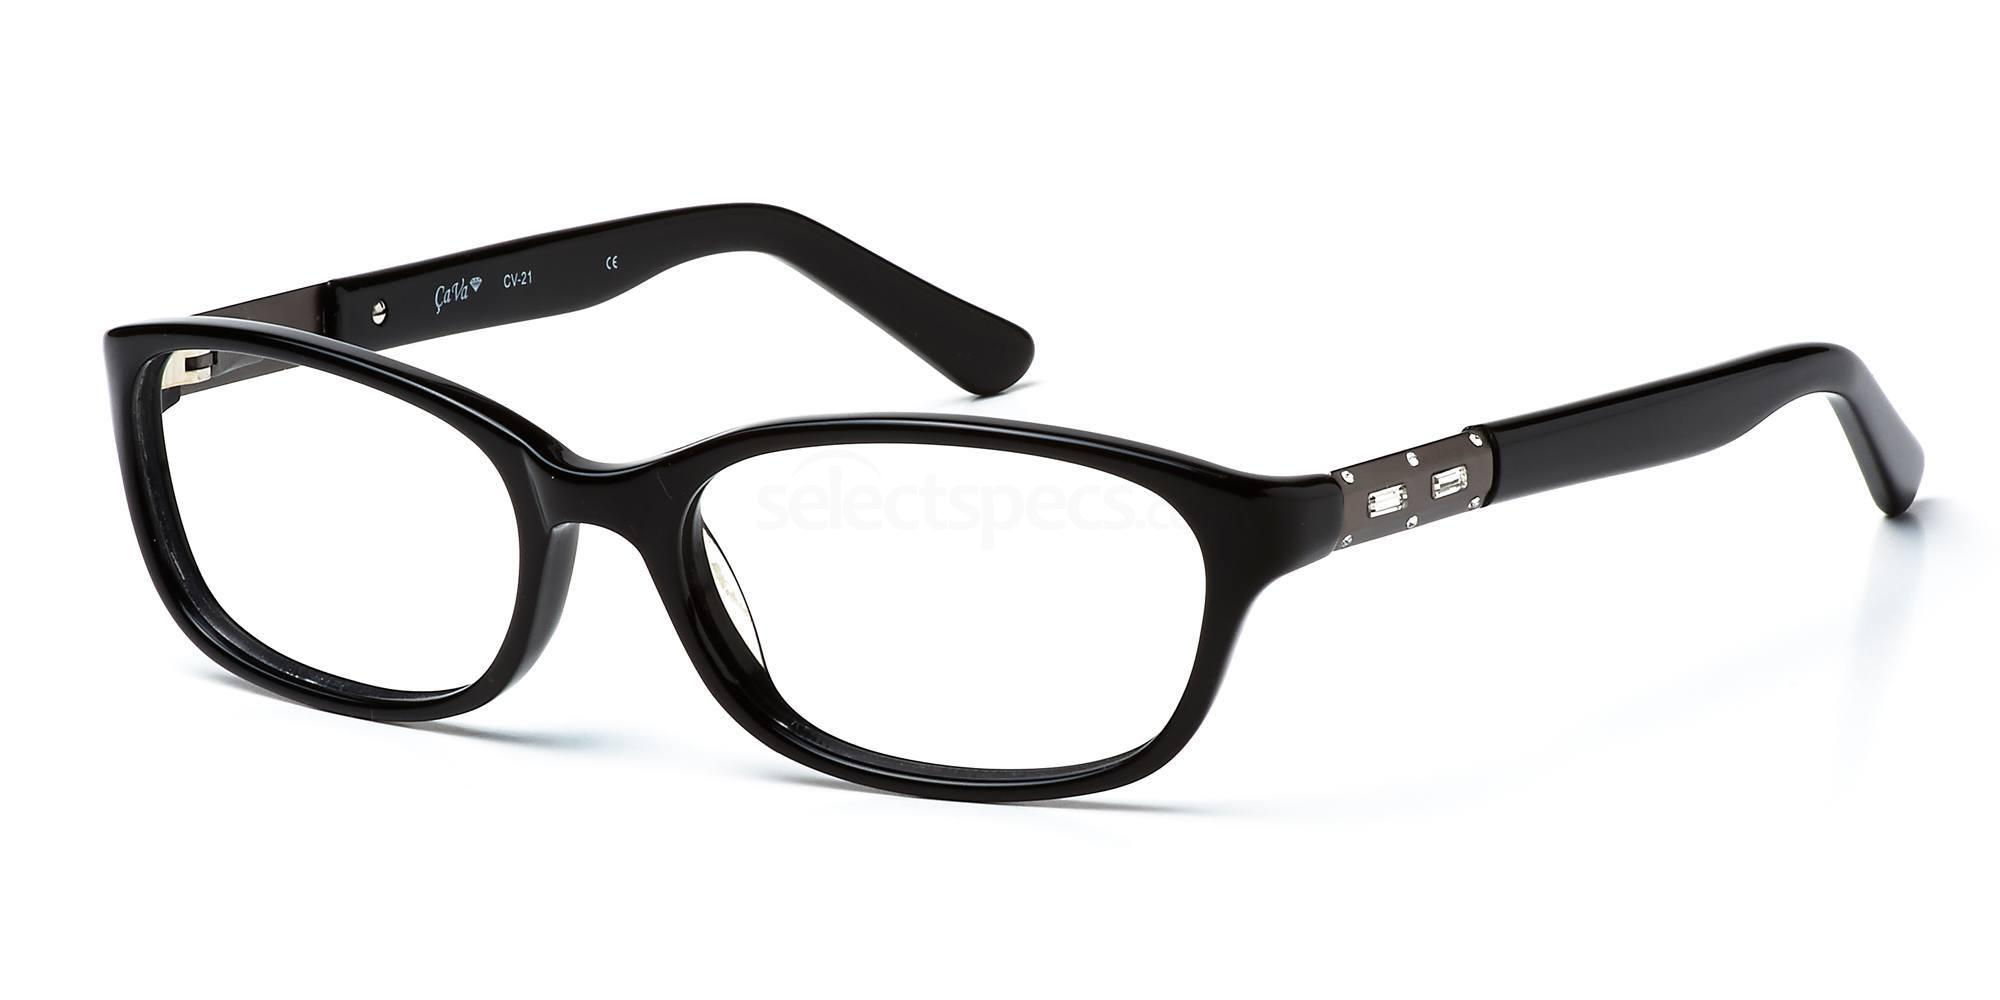 C1 CV21 Glasses, Ca Va